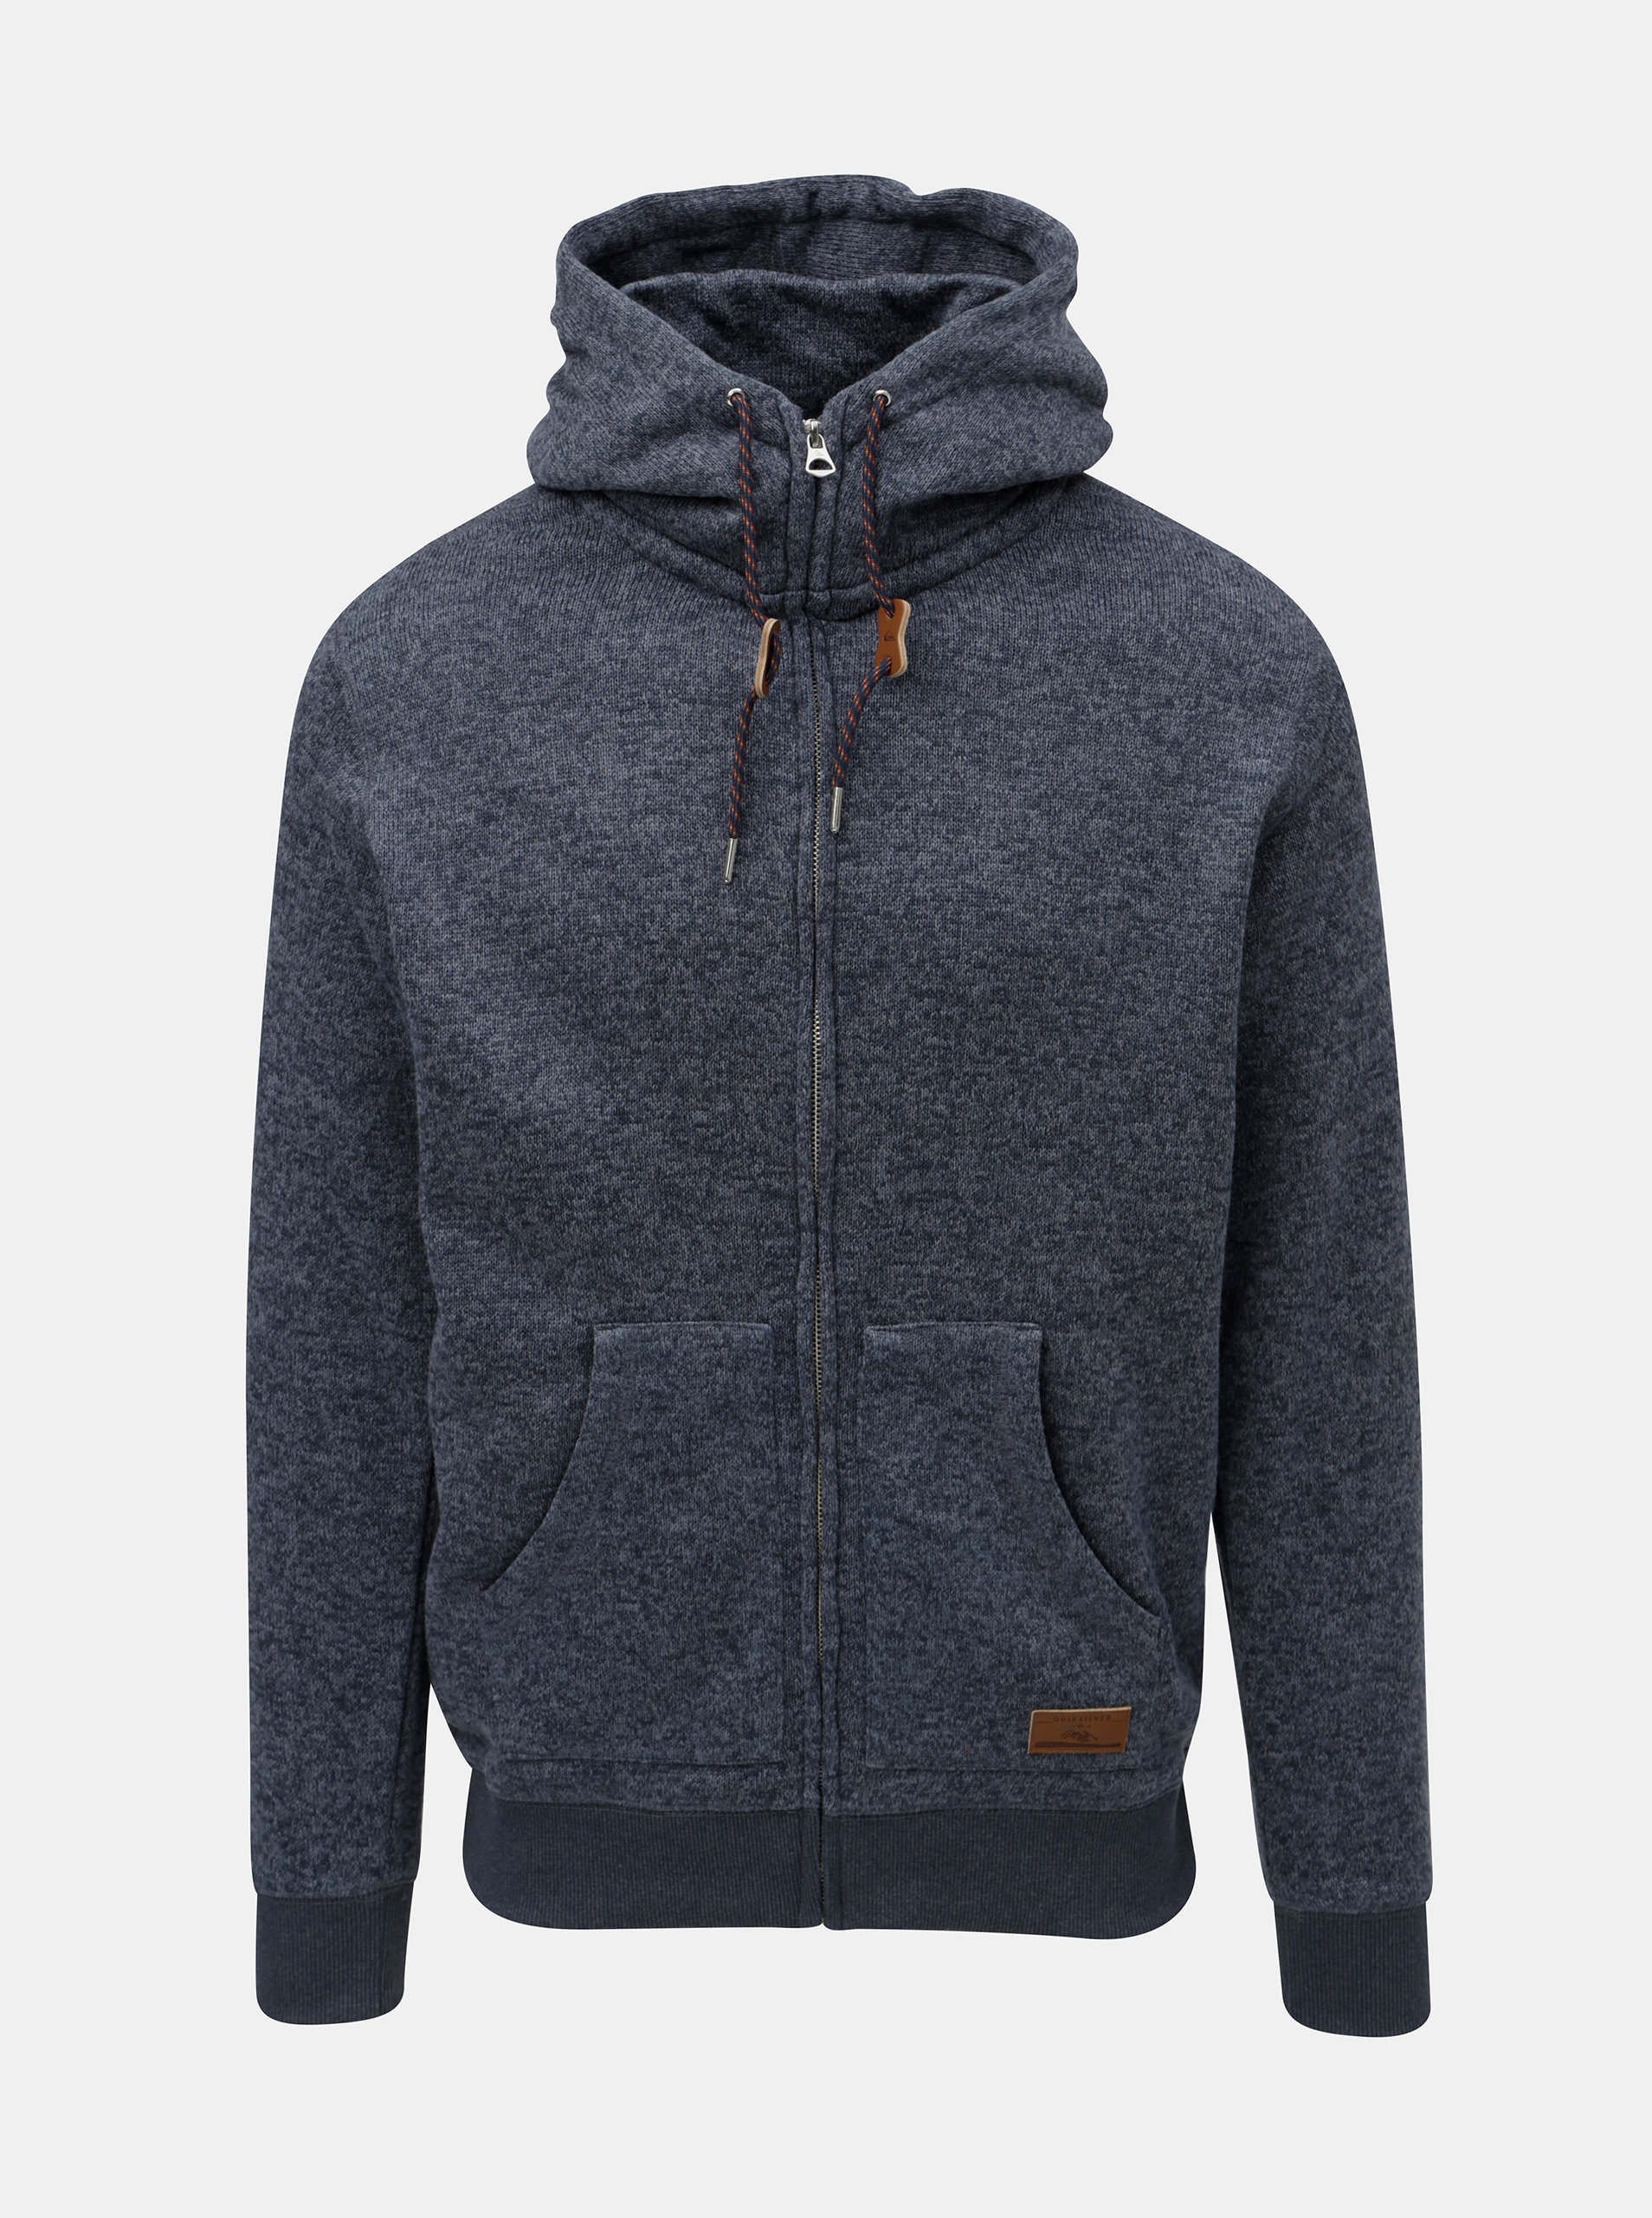 Modrý pánský žíhaný svetr s kapucí na zip Quiksilver Keller ... c19a4bf836